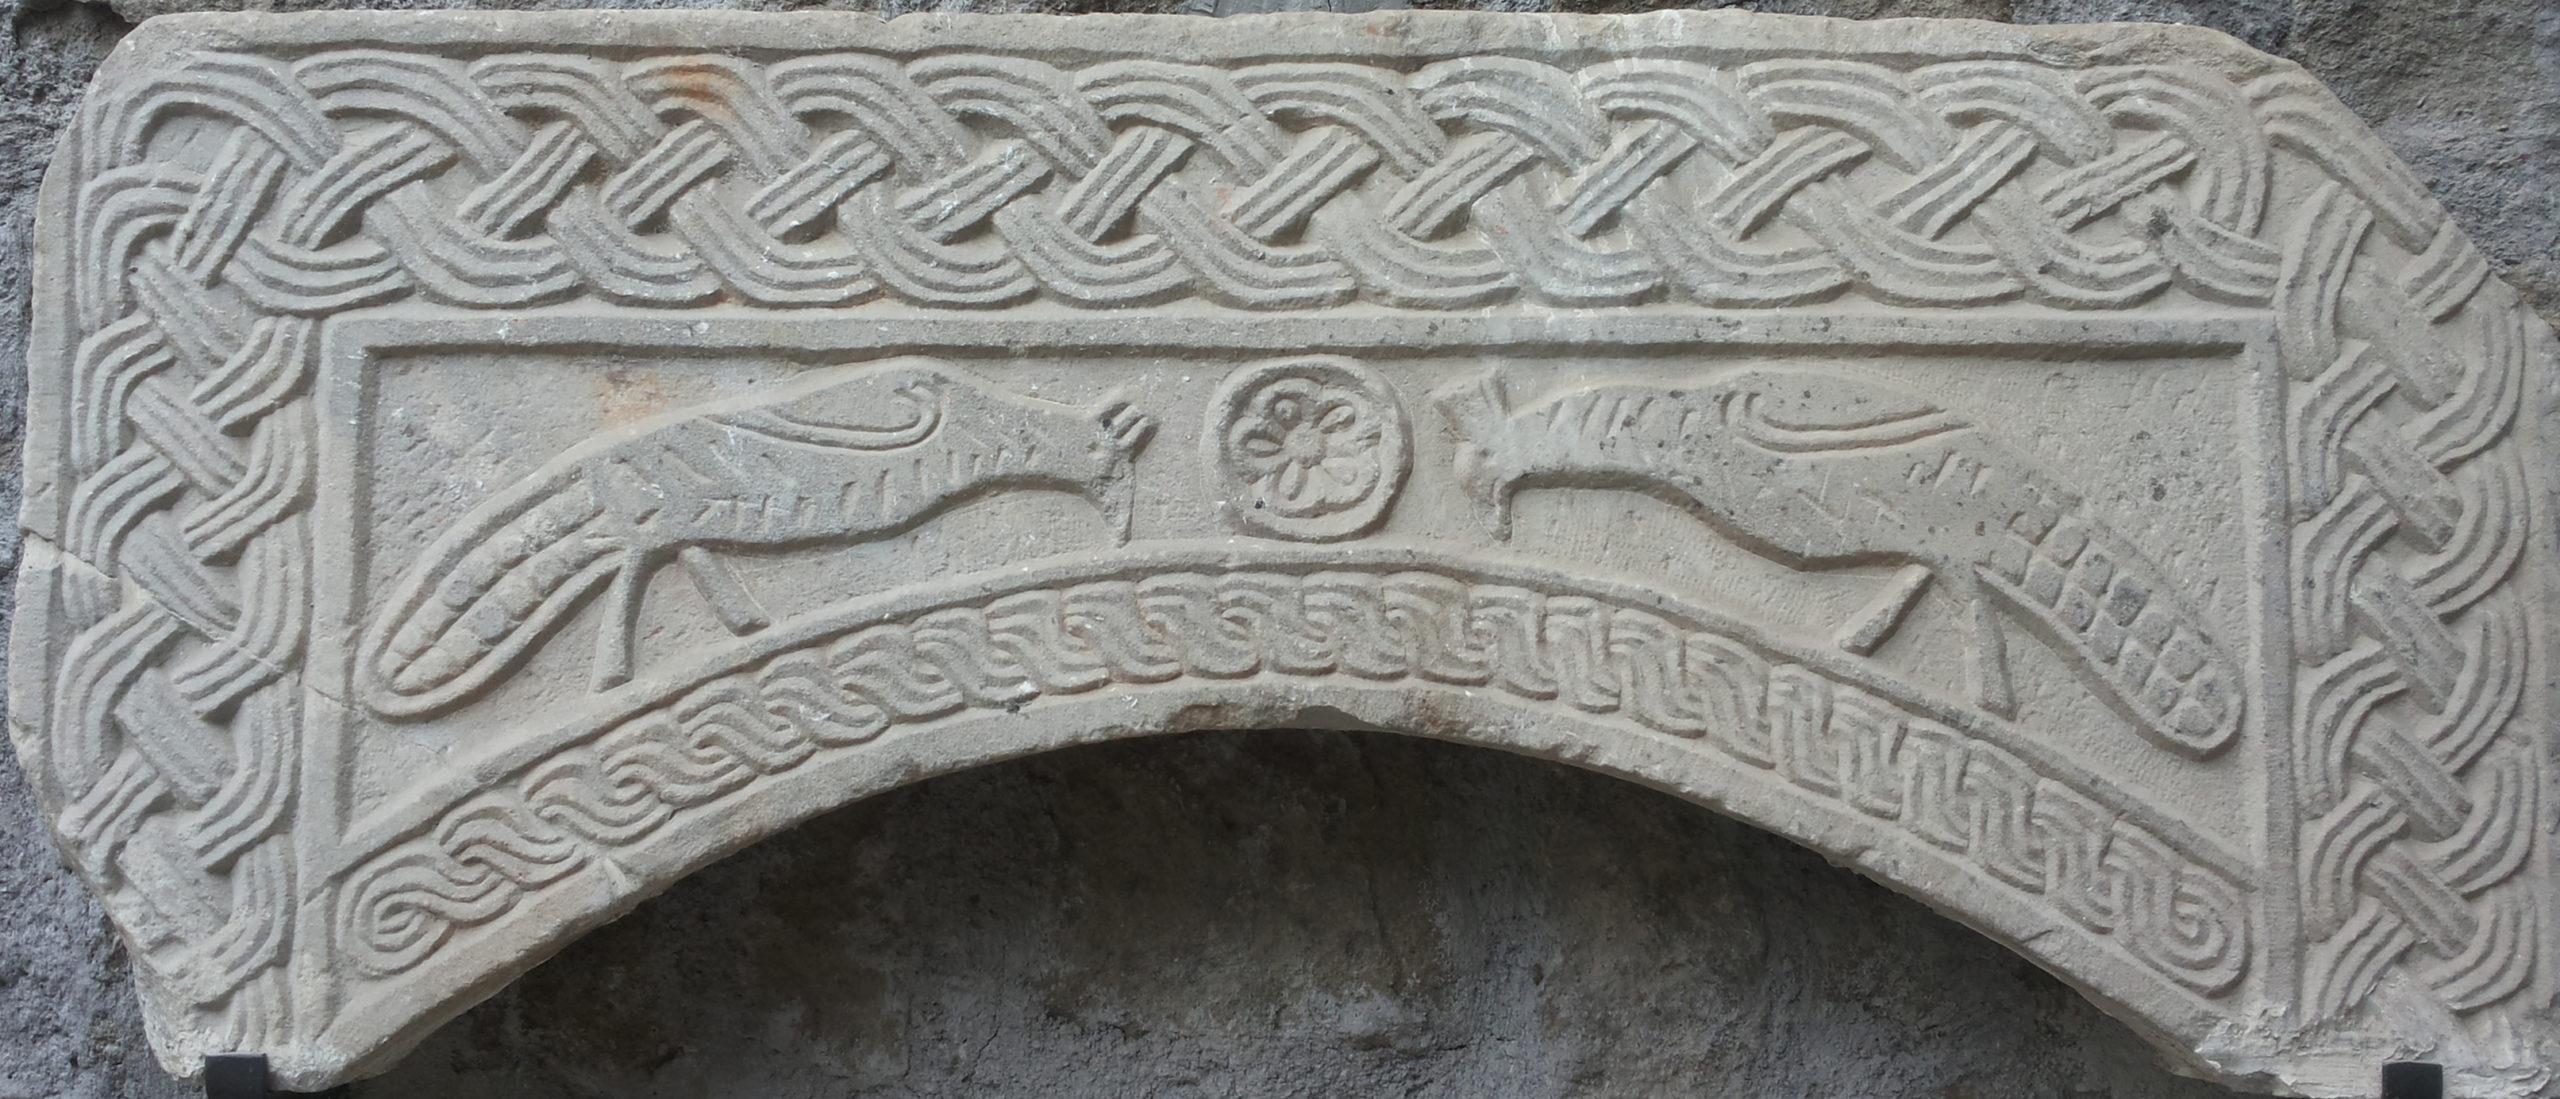 Arco di ciborio